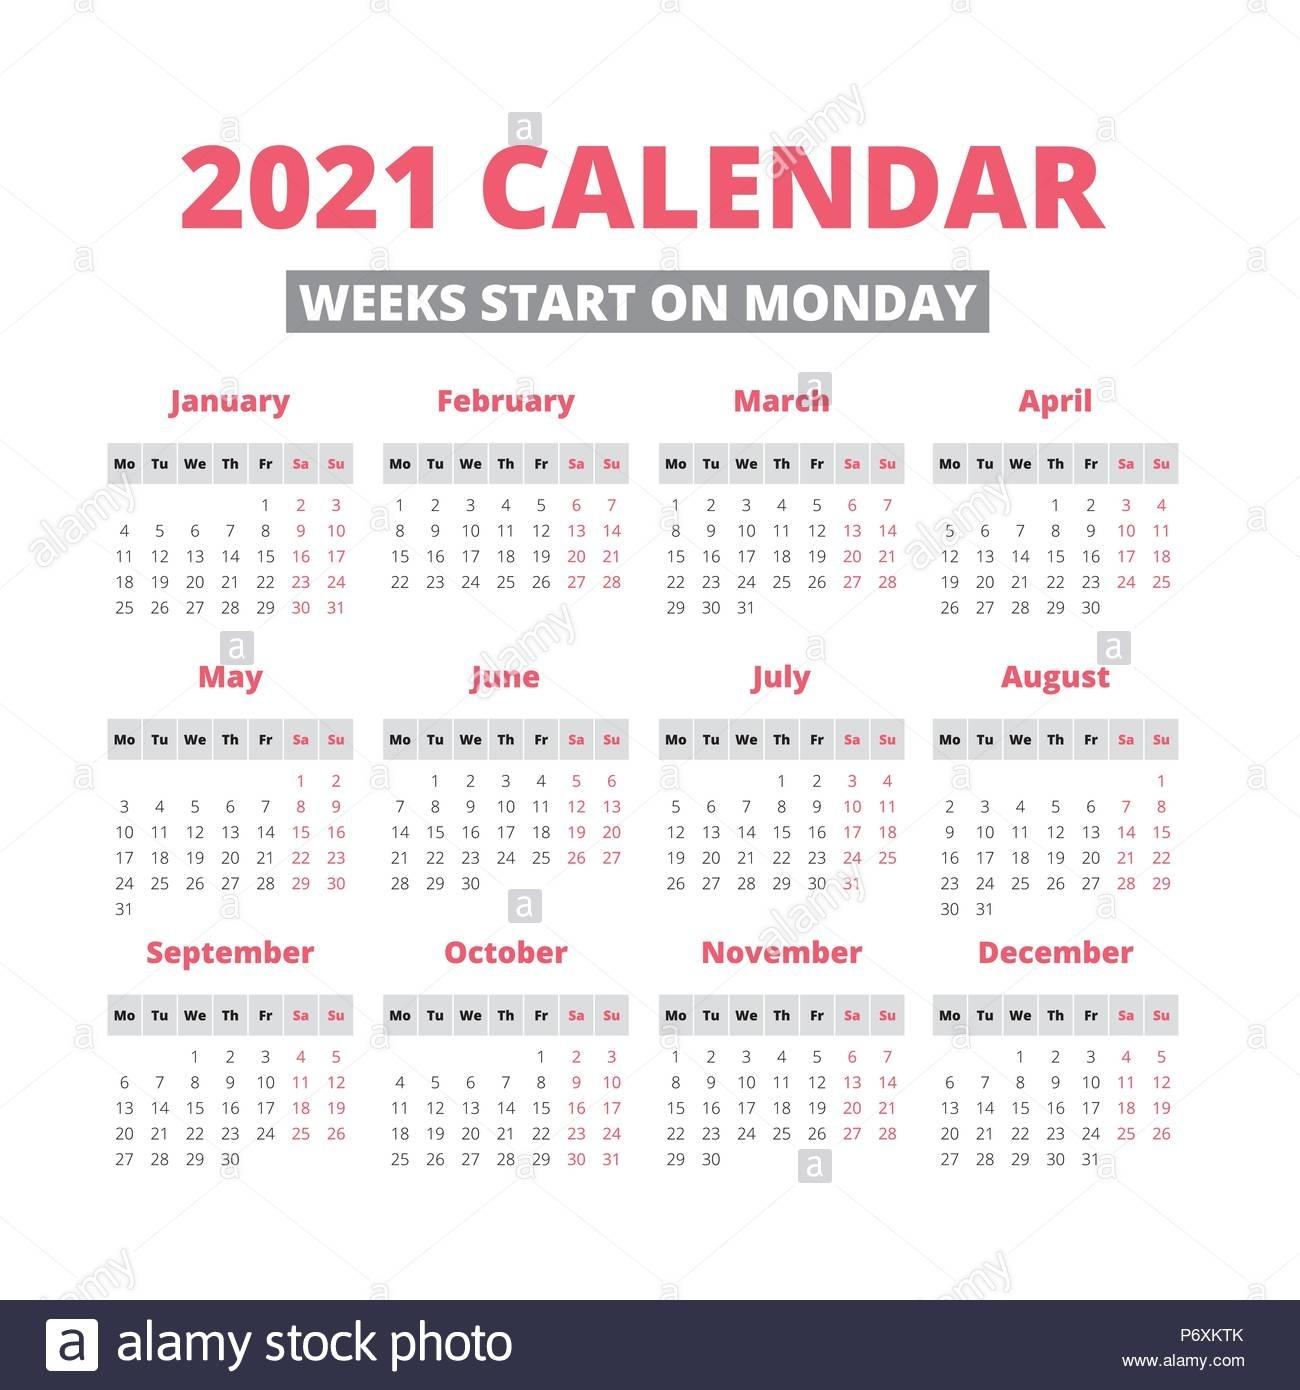 Pick 2021 Calendar Weeks Start On Monday